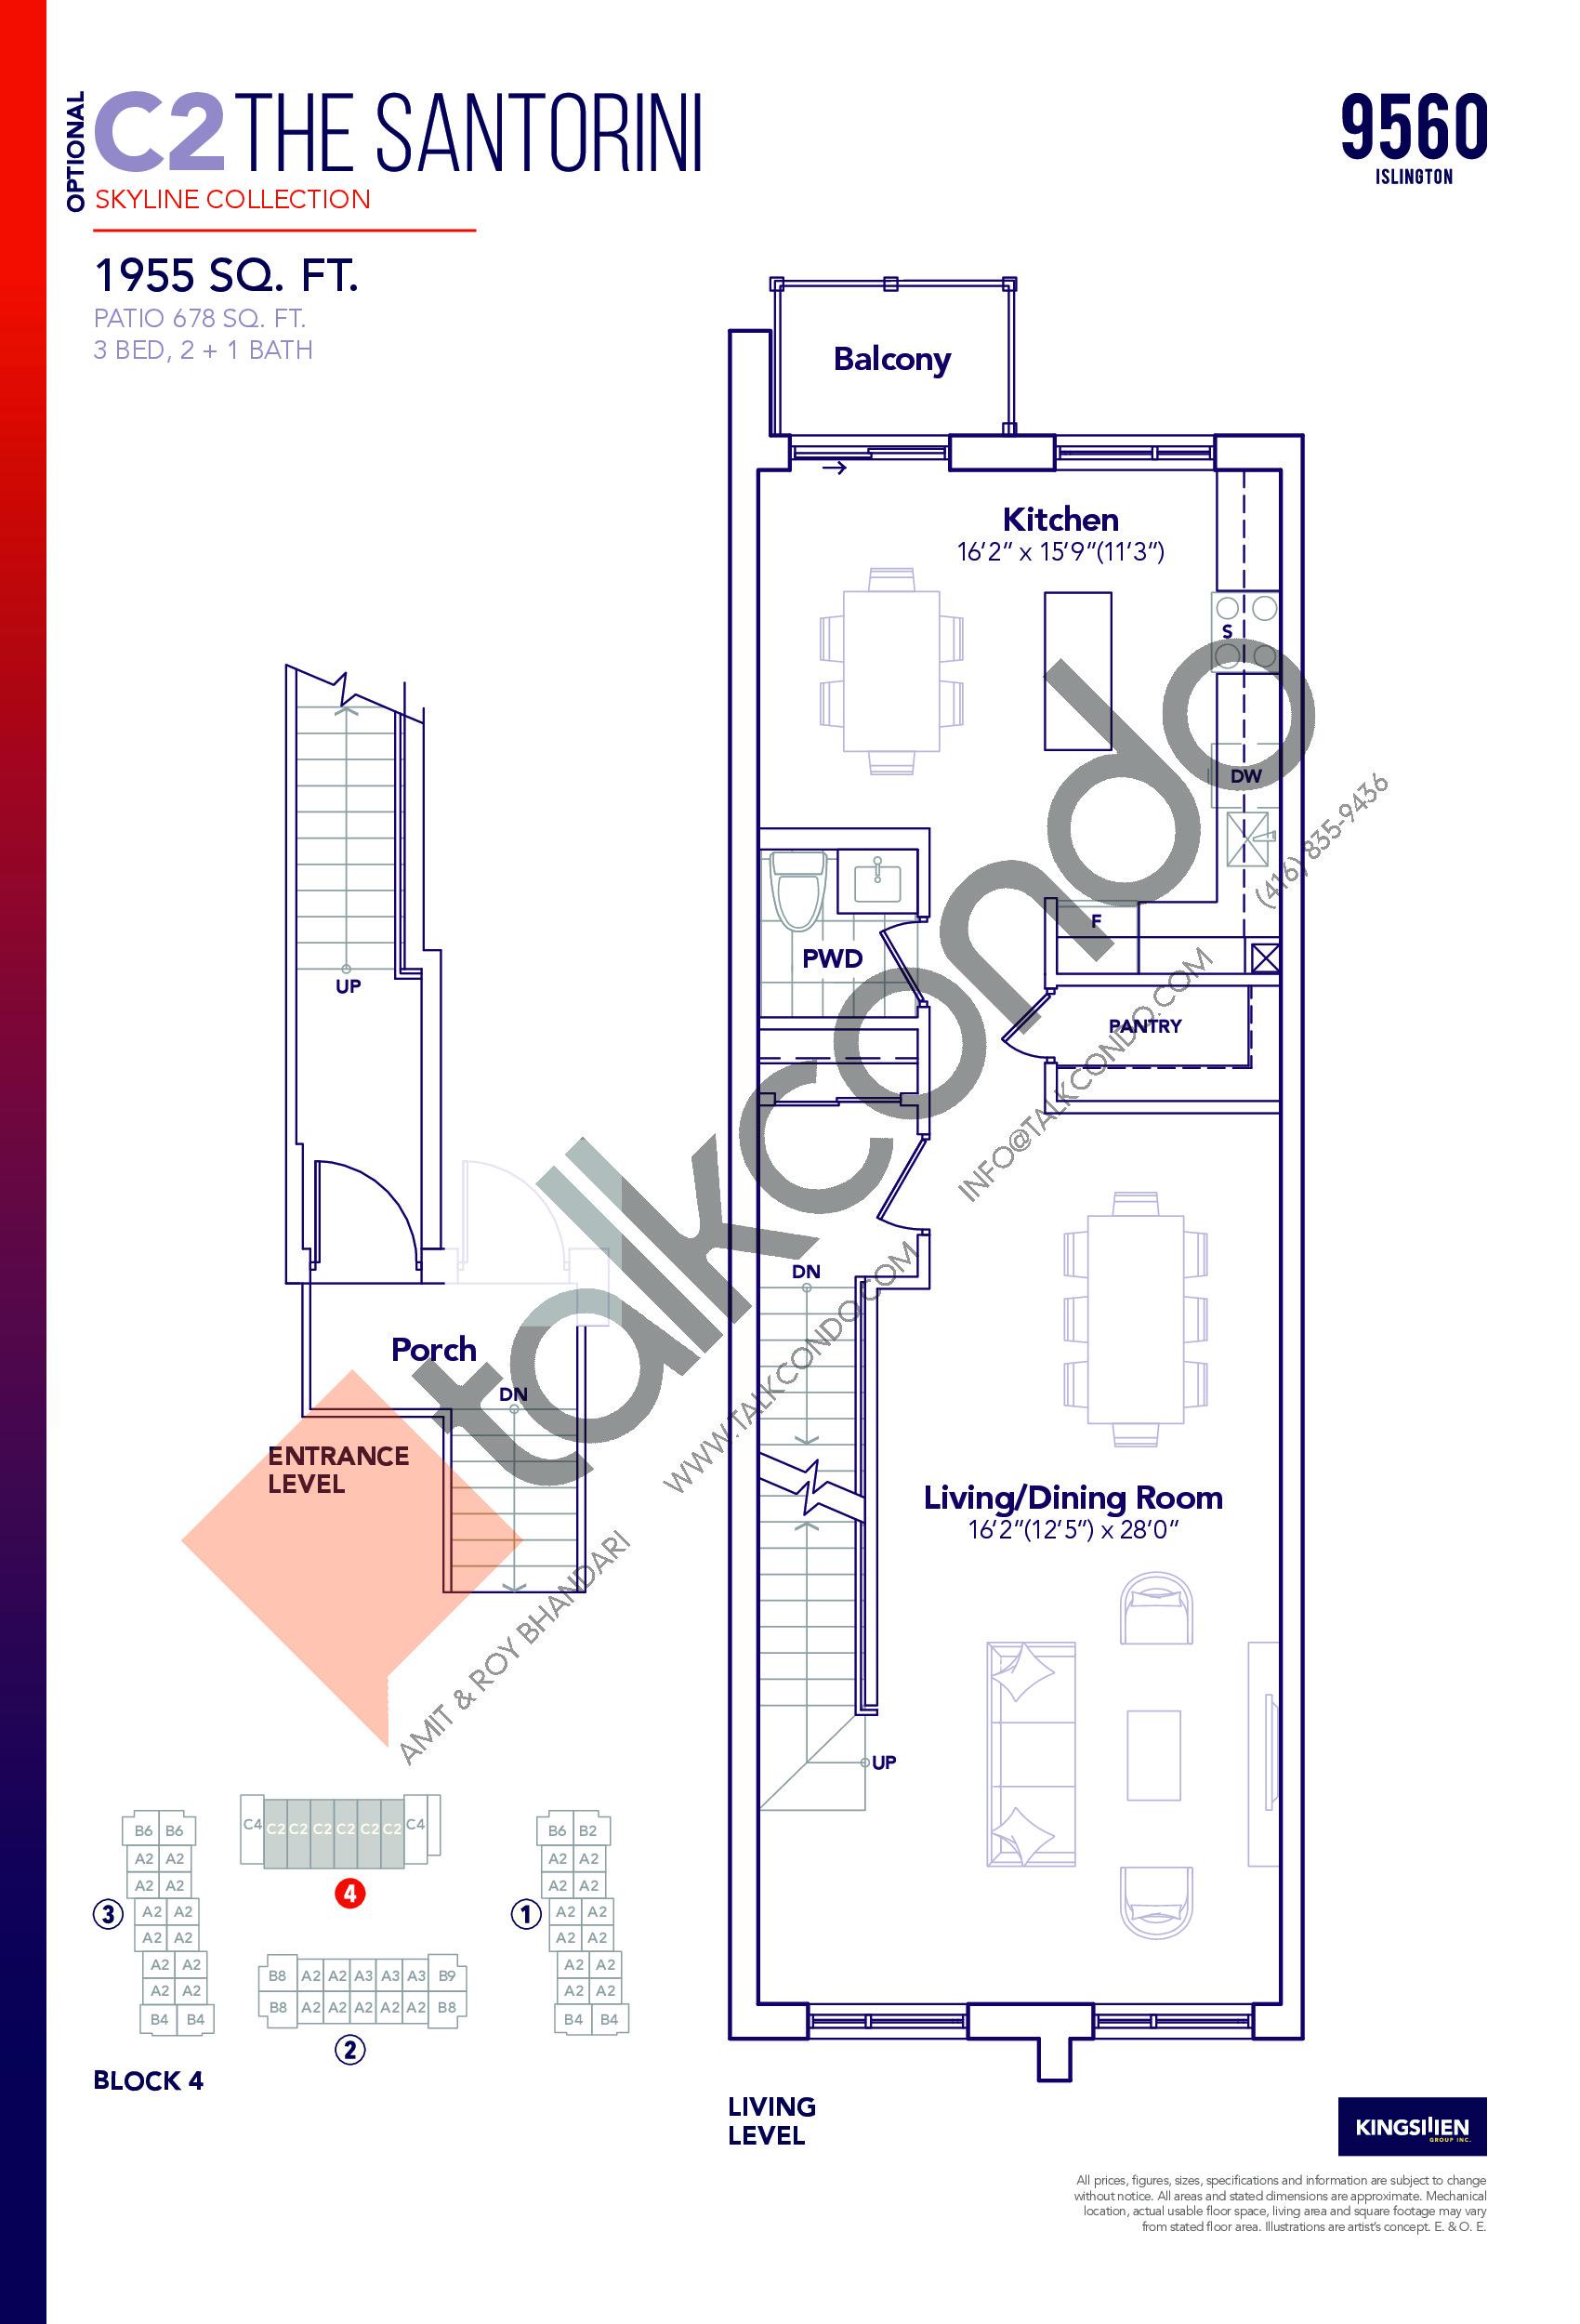 C2 The Santorini - Skyline Collection (1/2) Optional Floor Plan at Capital City Towns - 1955 sq.ft